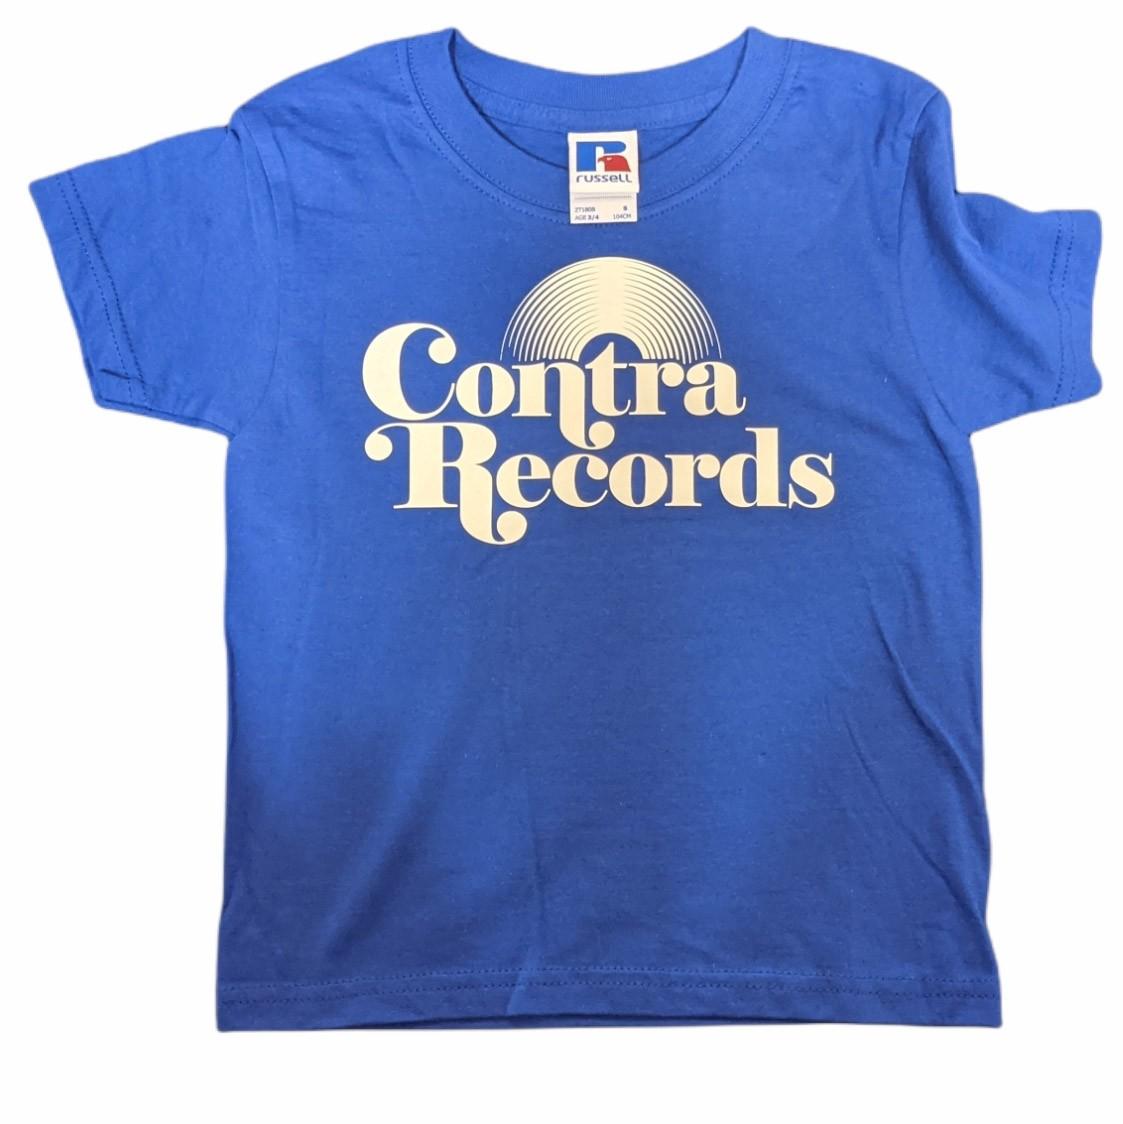 Contra Records - Vinyl classic - Kids Shirt royal blue